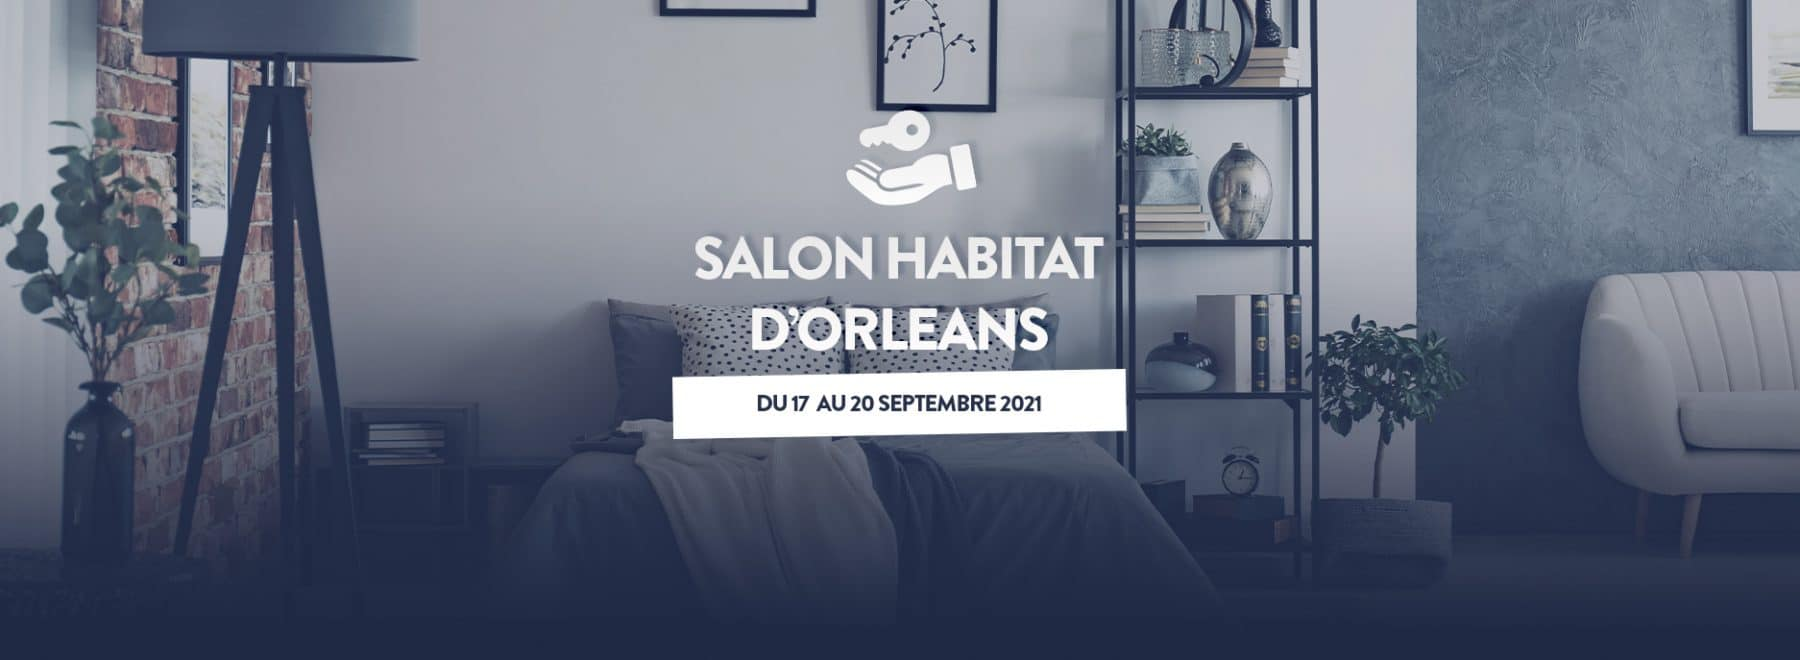 salon habitat orleans